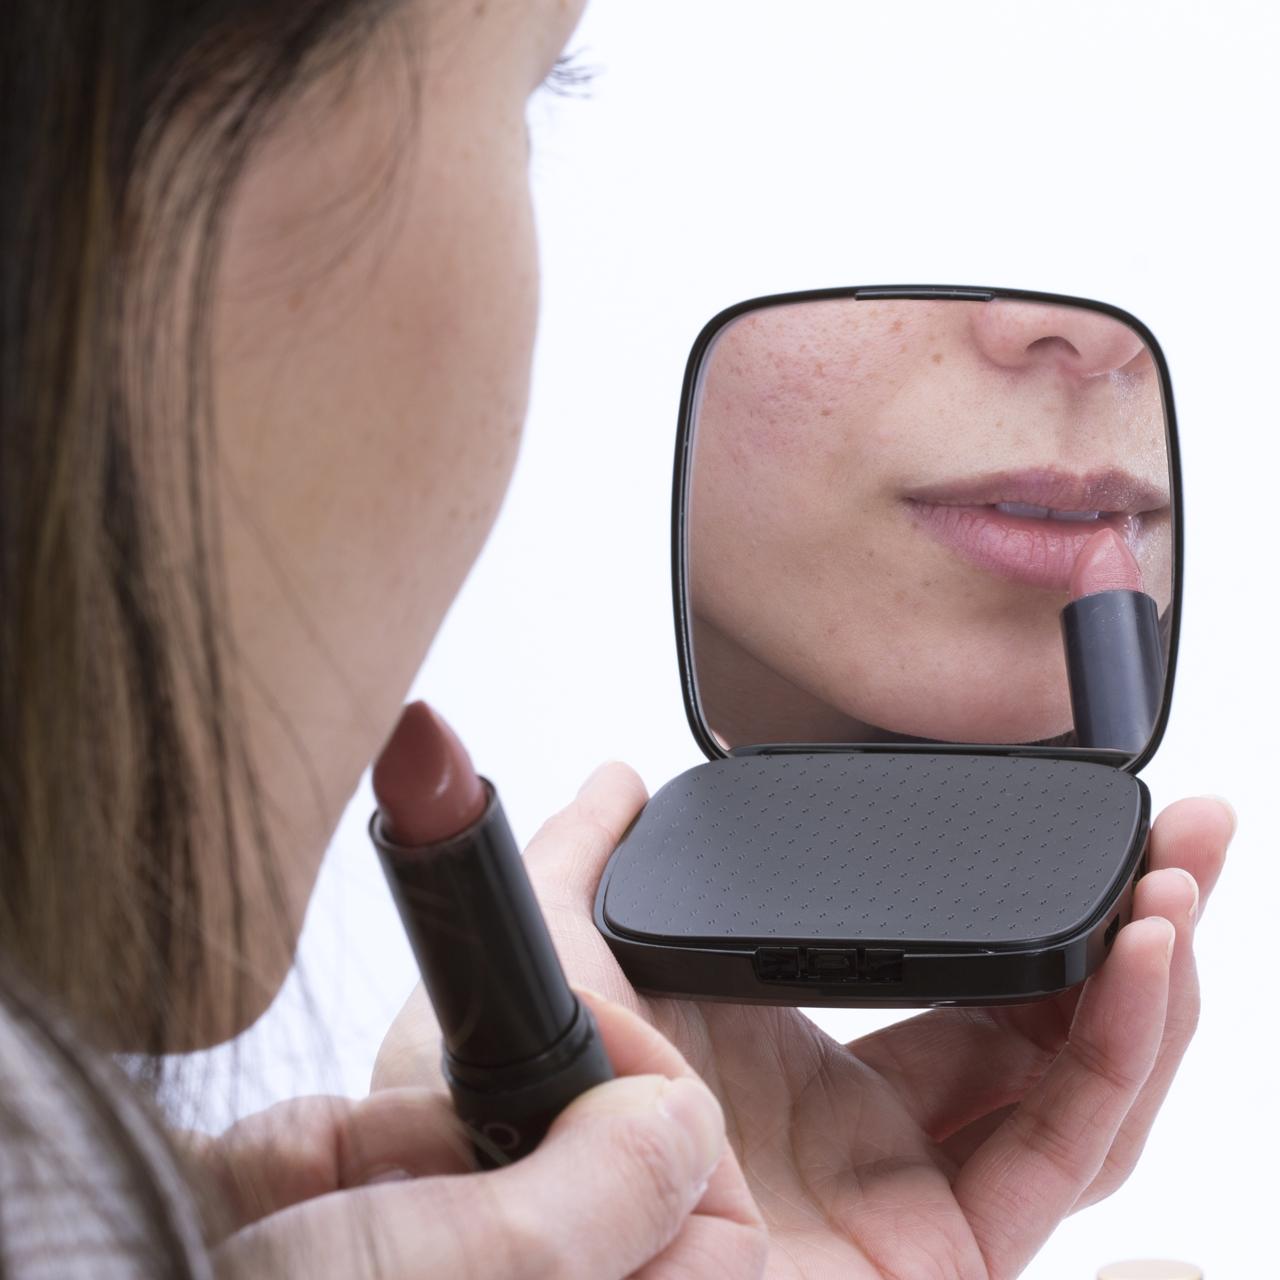 Prezzybox Powerbank Mirror Review